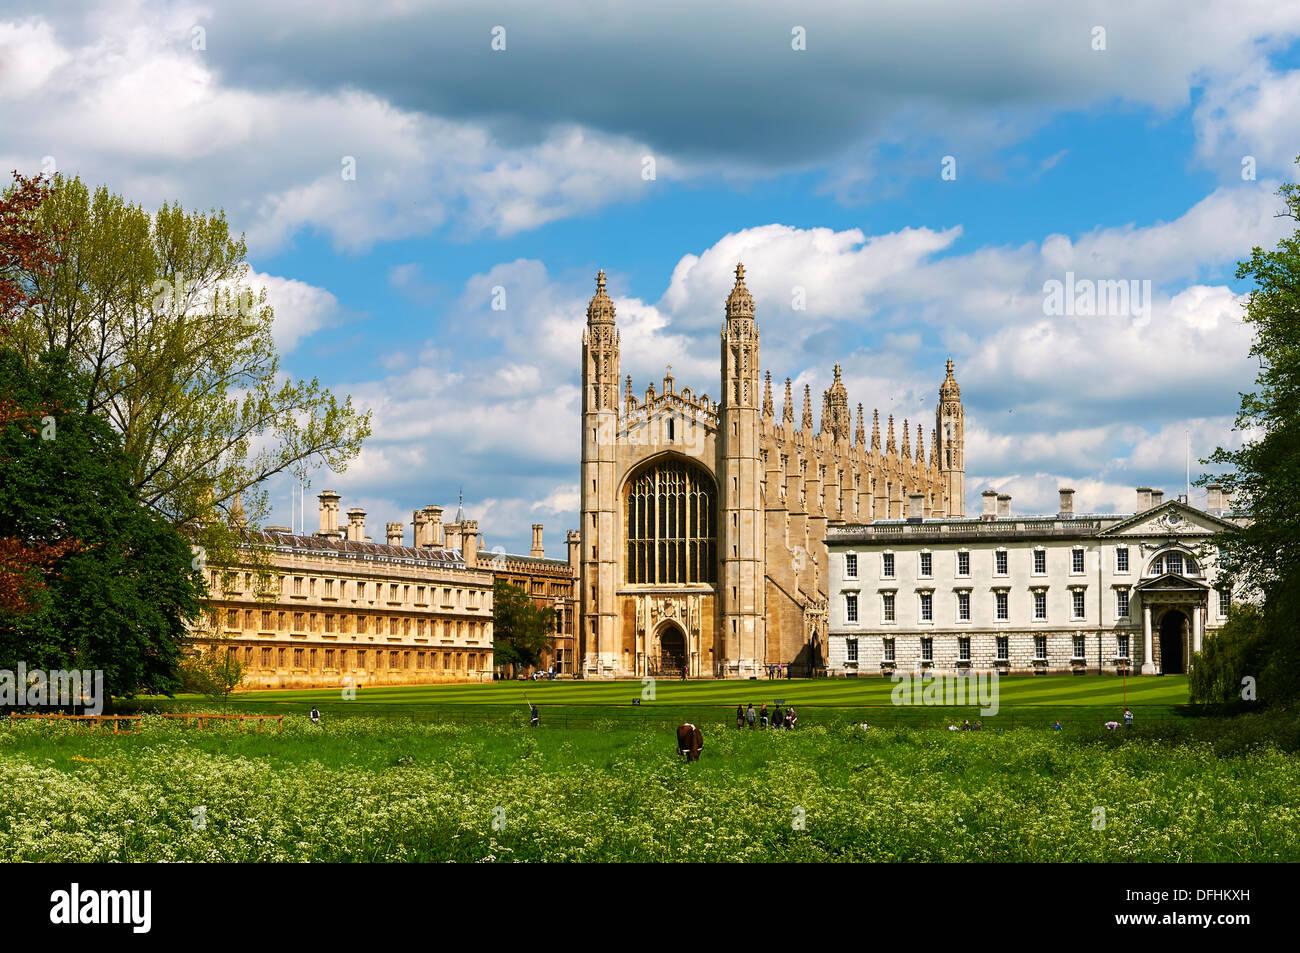 Kings College Chapel in Cambridge, UK - Stock Image